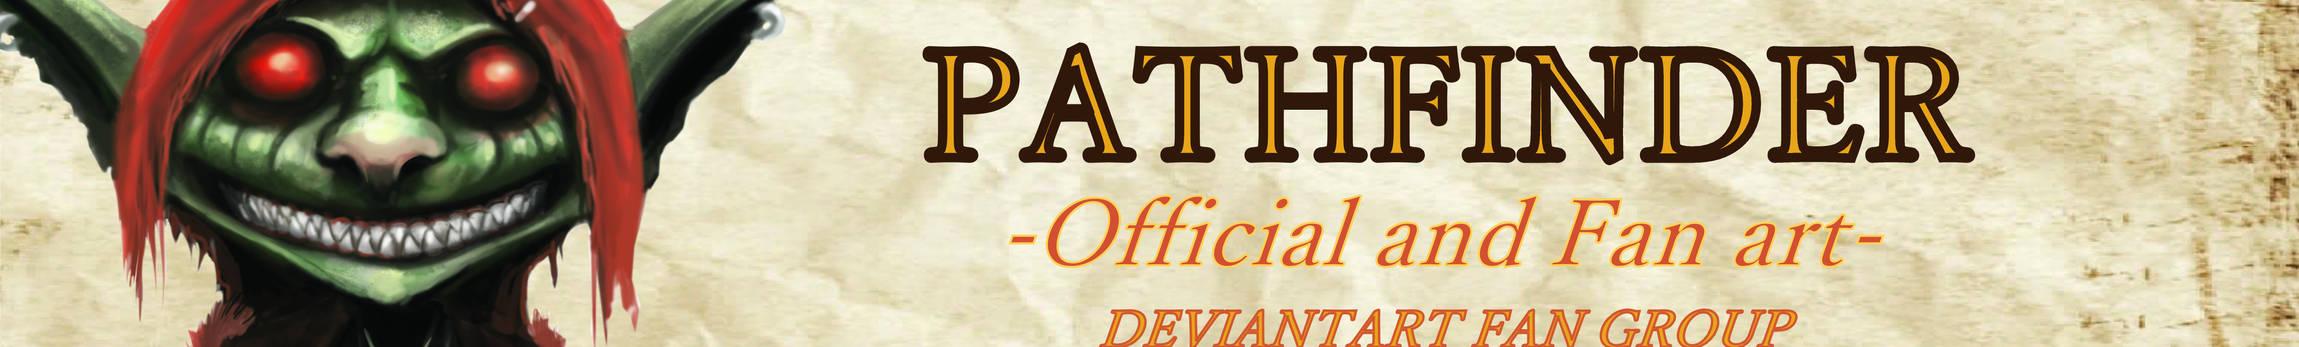 Pathfinder-Art new group by Fantasy-NPC